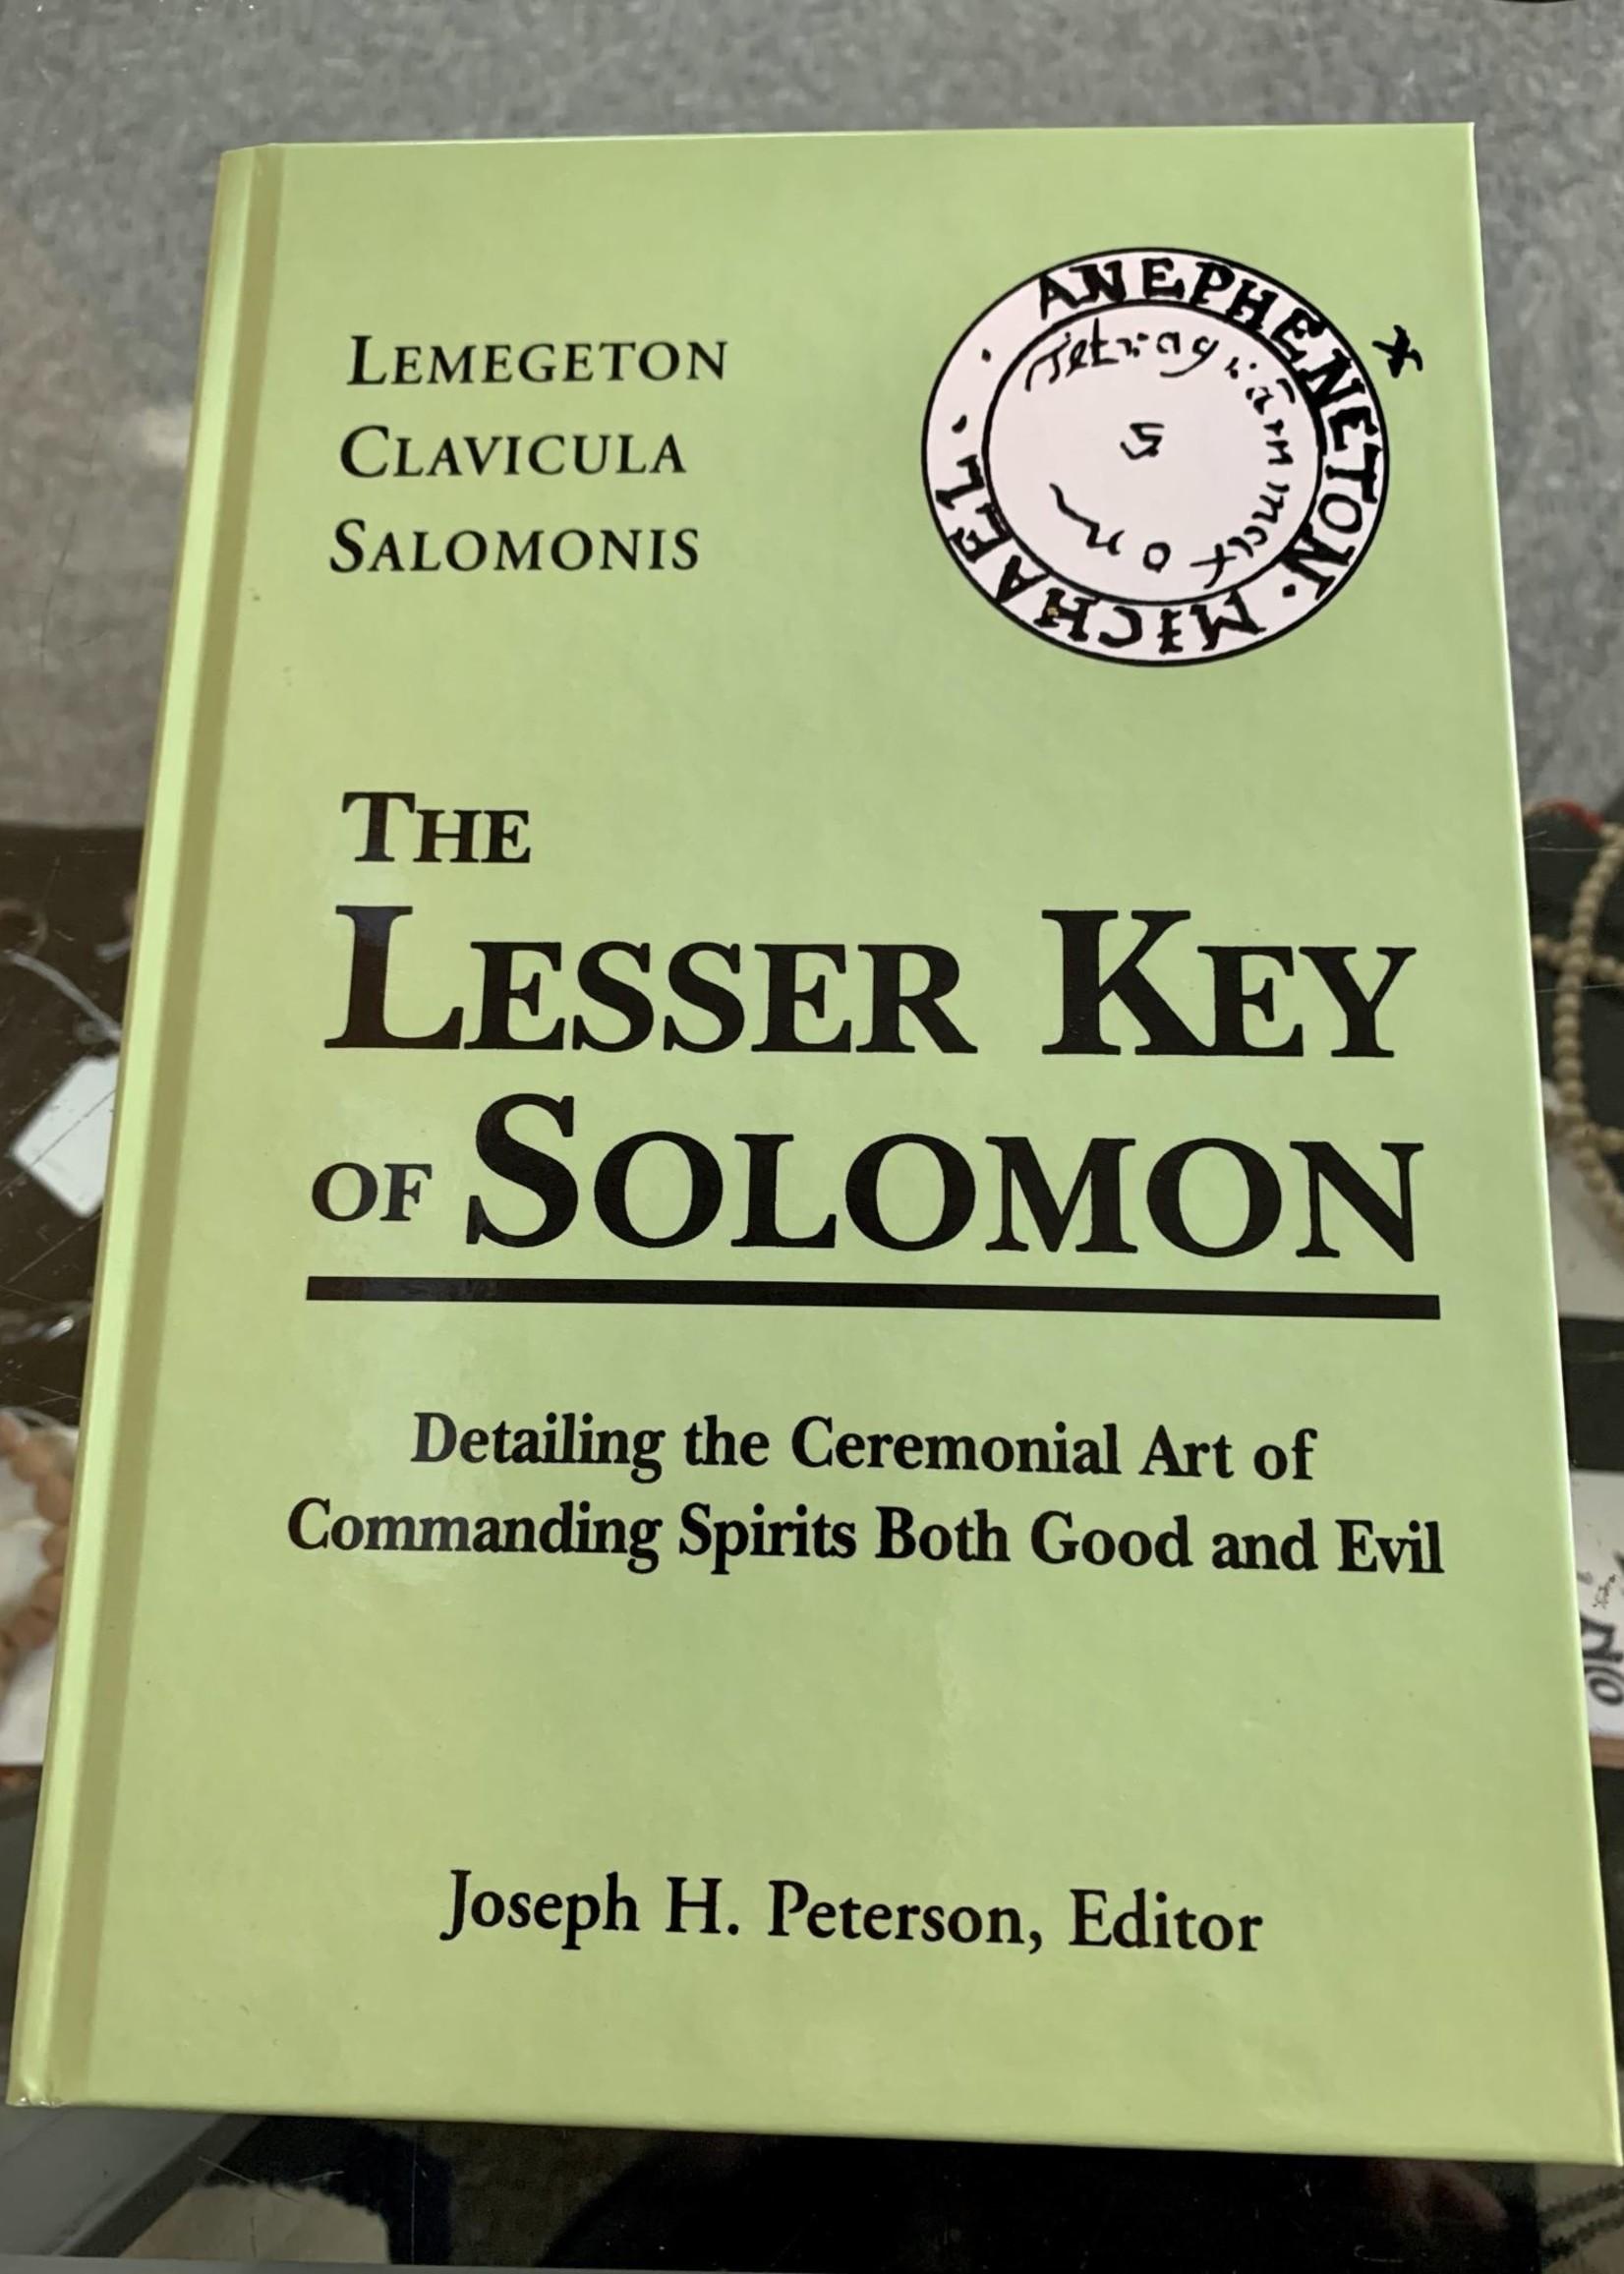 The Lesser Key of Solomon Lemegeton Clavicula Salomonis - Joseph H. Peterson